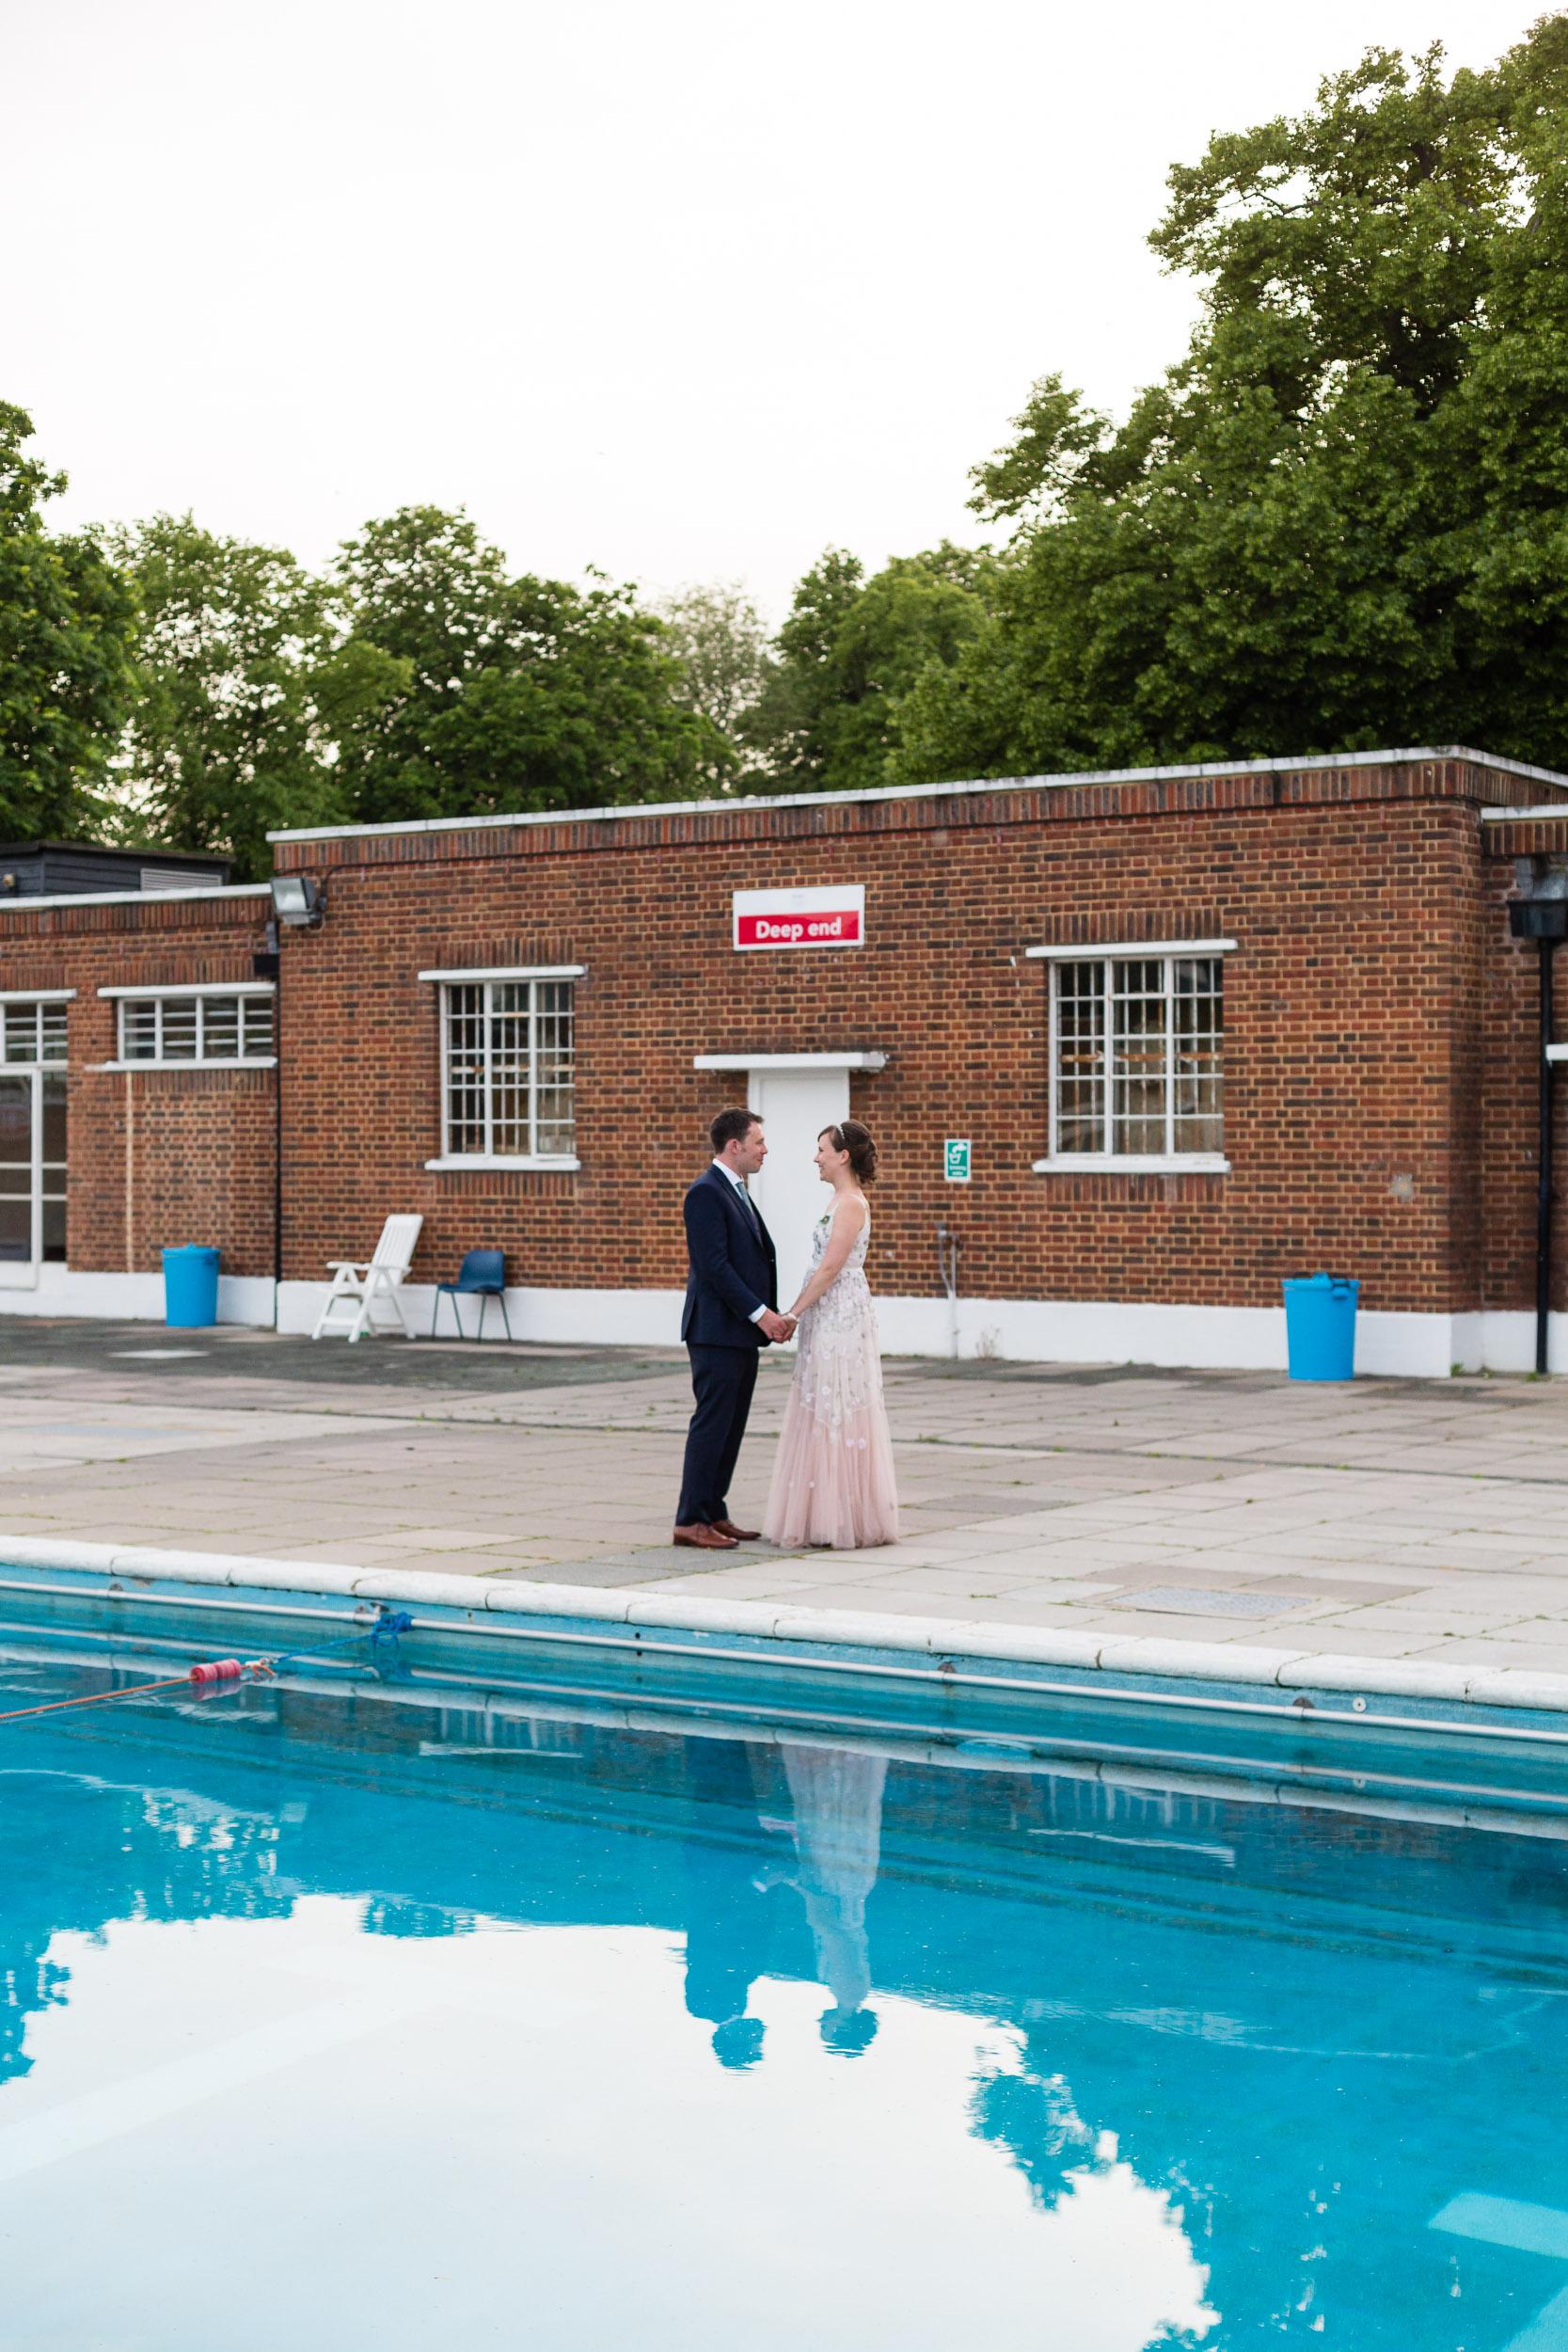 brockwell-lido-brixton-herne-hill-wedding-377.jpg